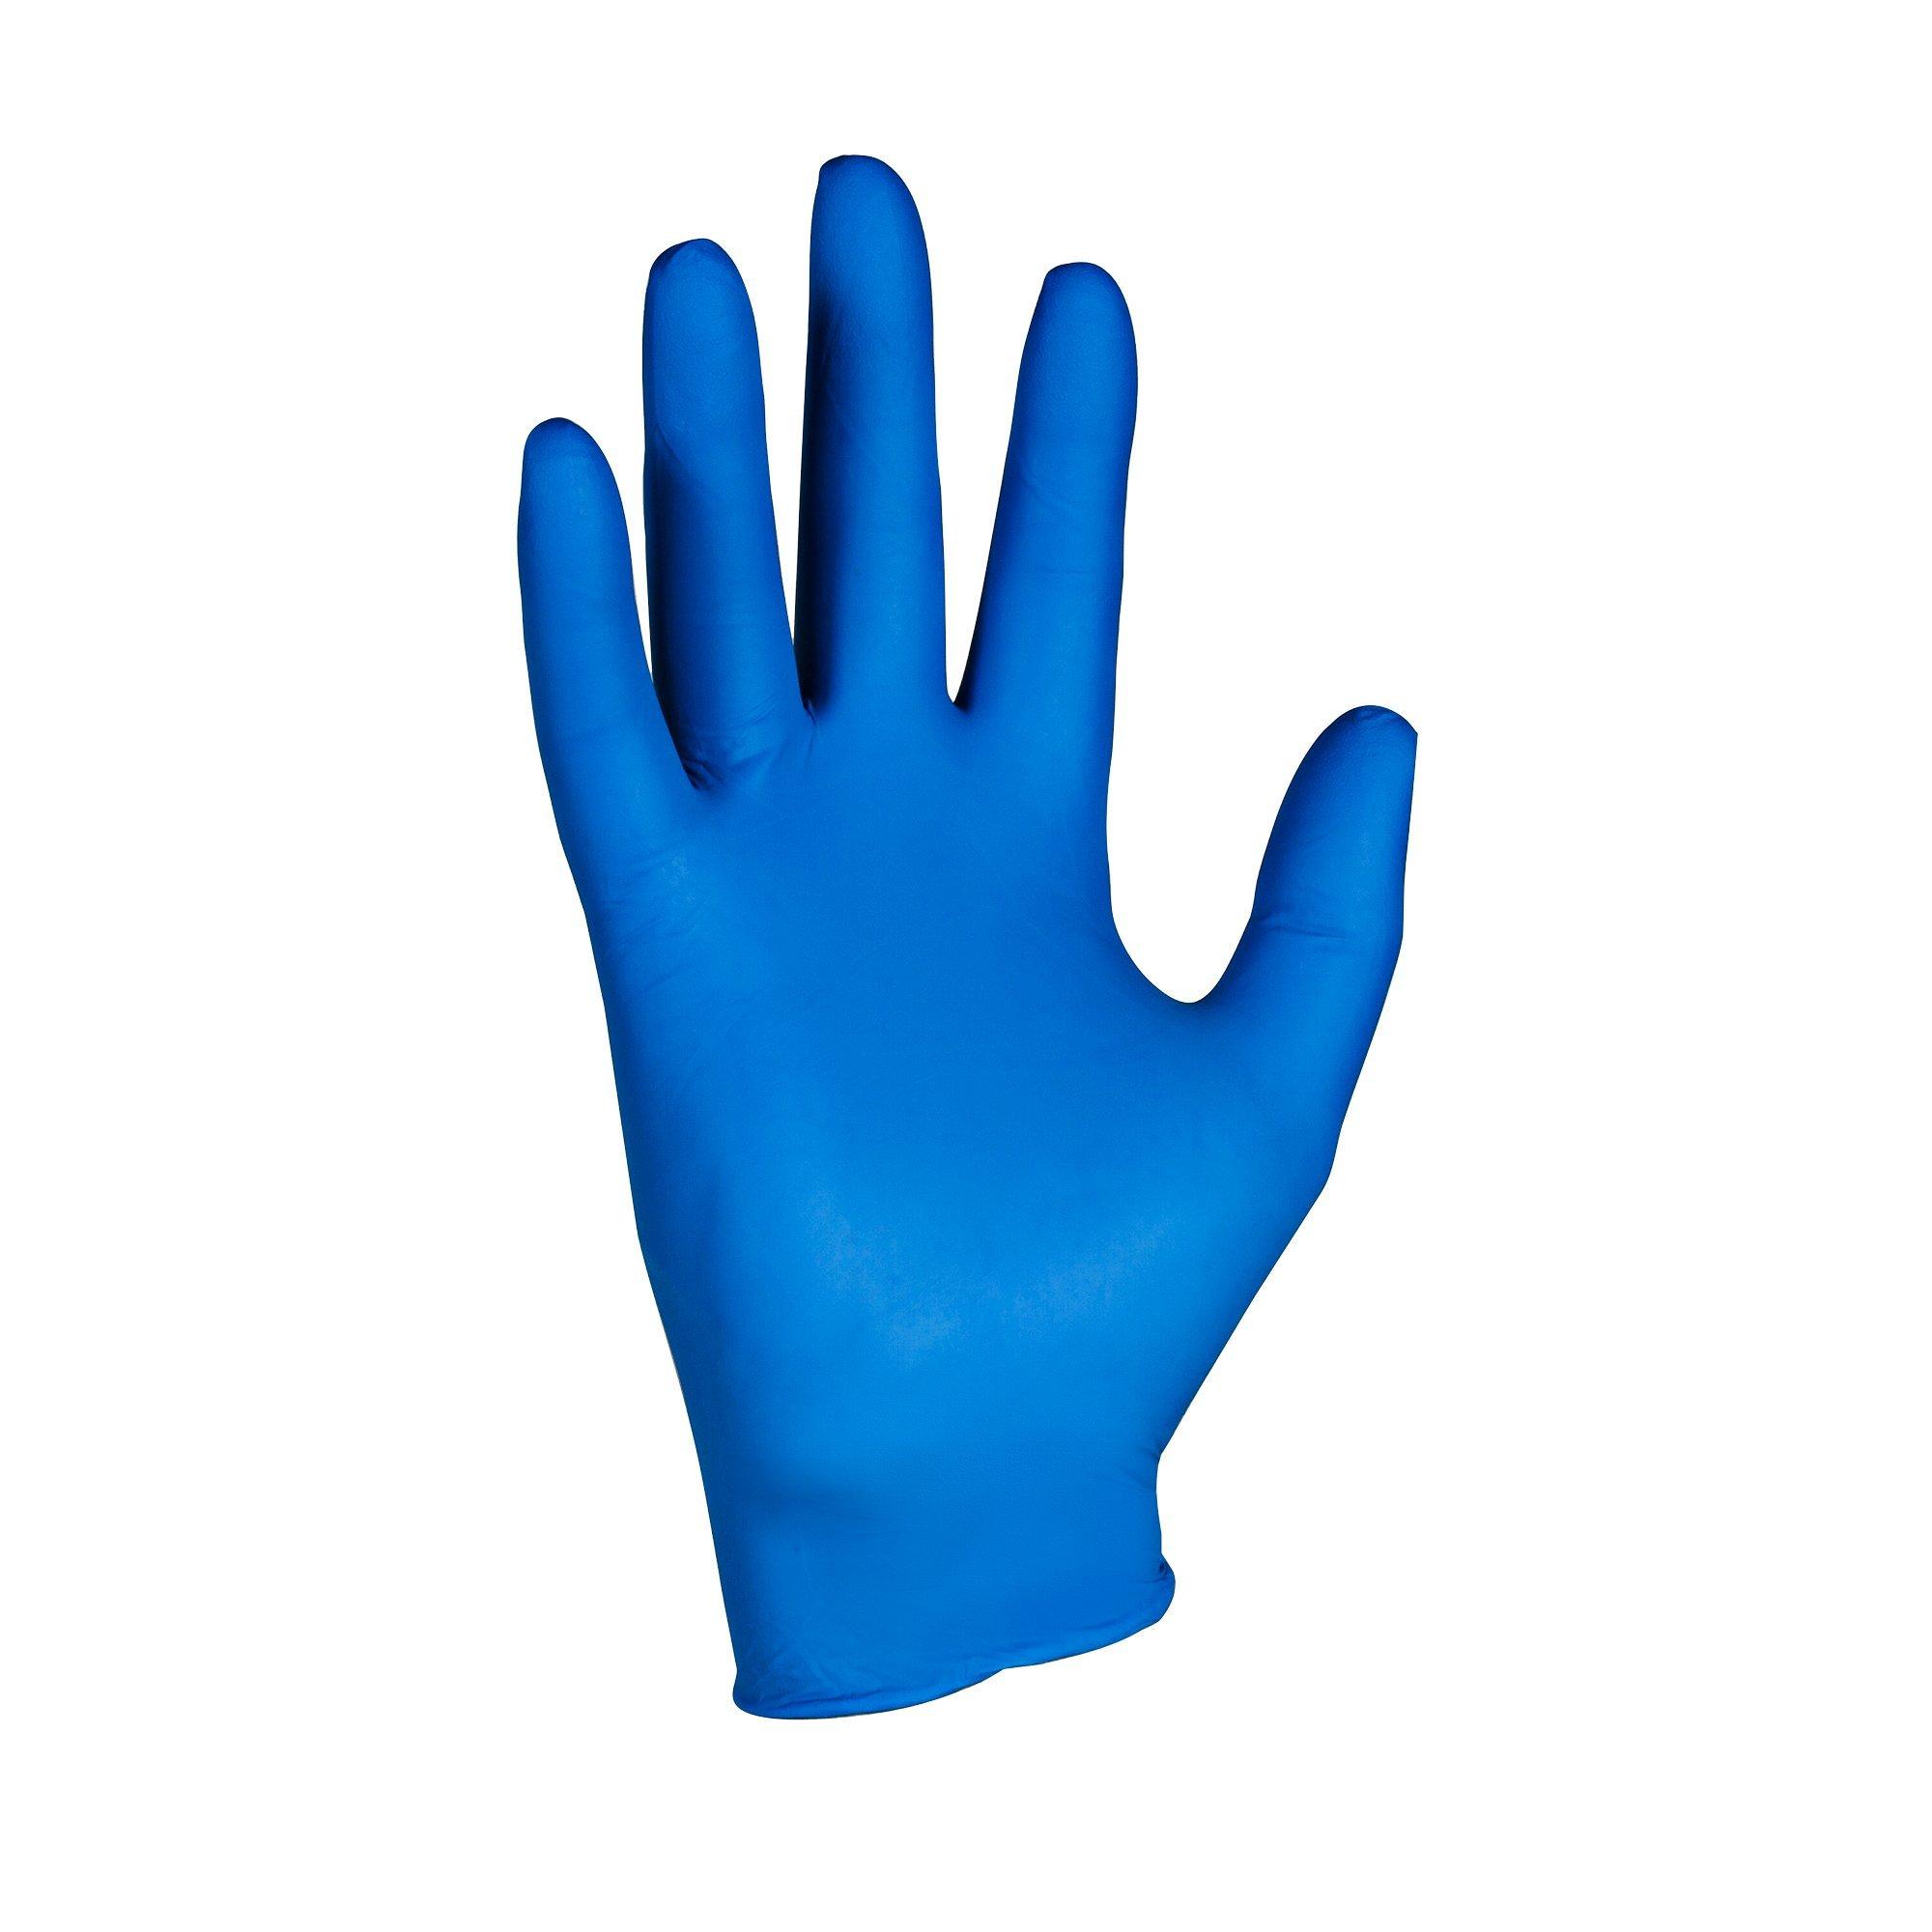 Kimberly-Clark KleenGuard G10 Nitrile Arctic Glove, Powder Free, 9-1/2'' Length, Large, Blue (Case of 2000)